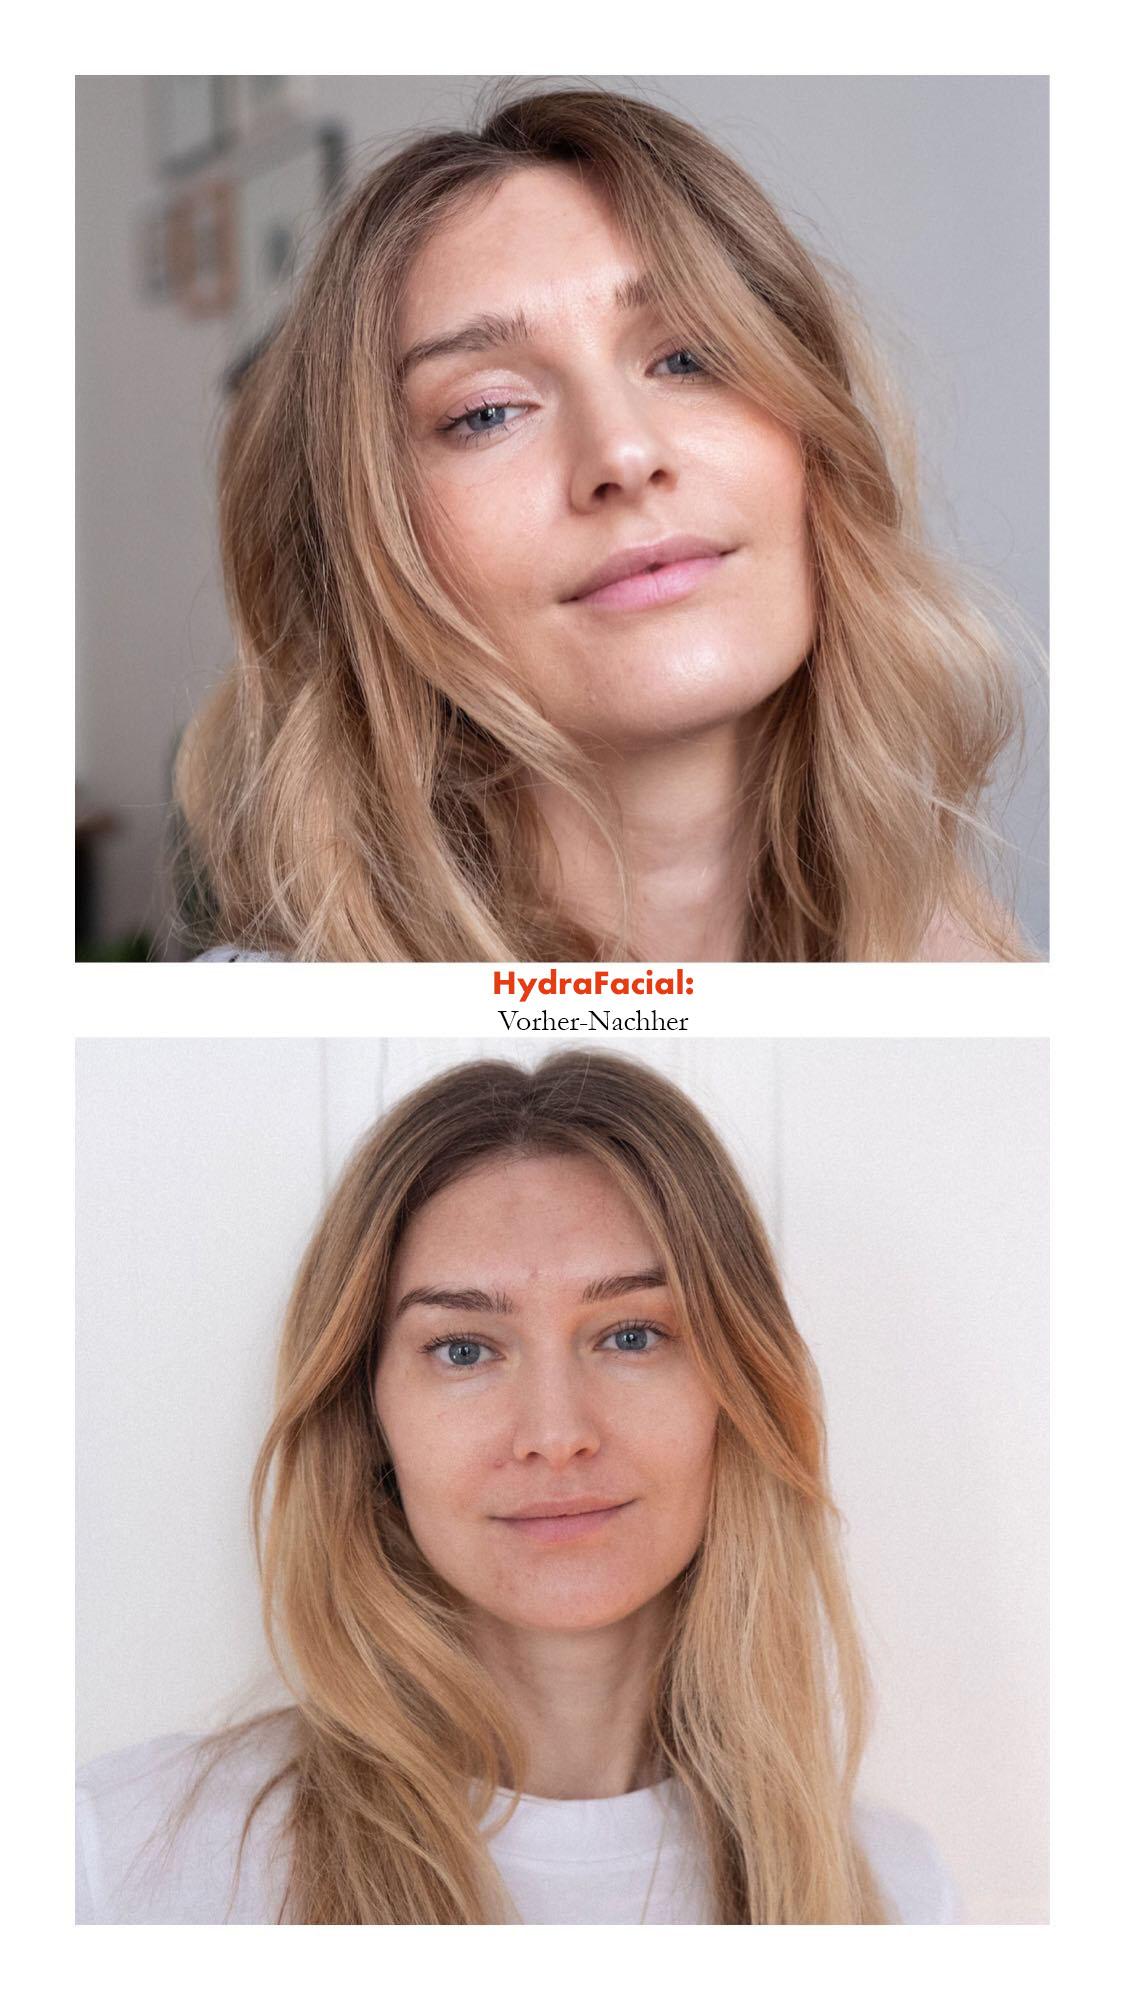 Beautyblog HydraFacial Vorher Nachher_1